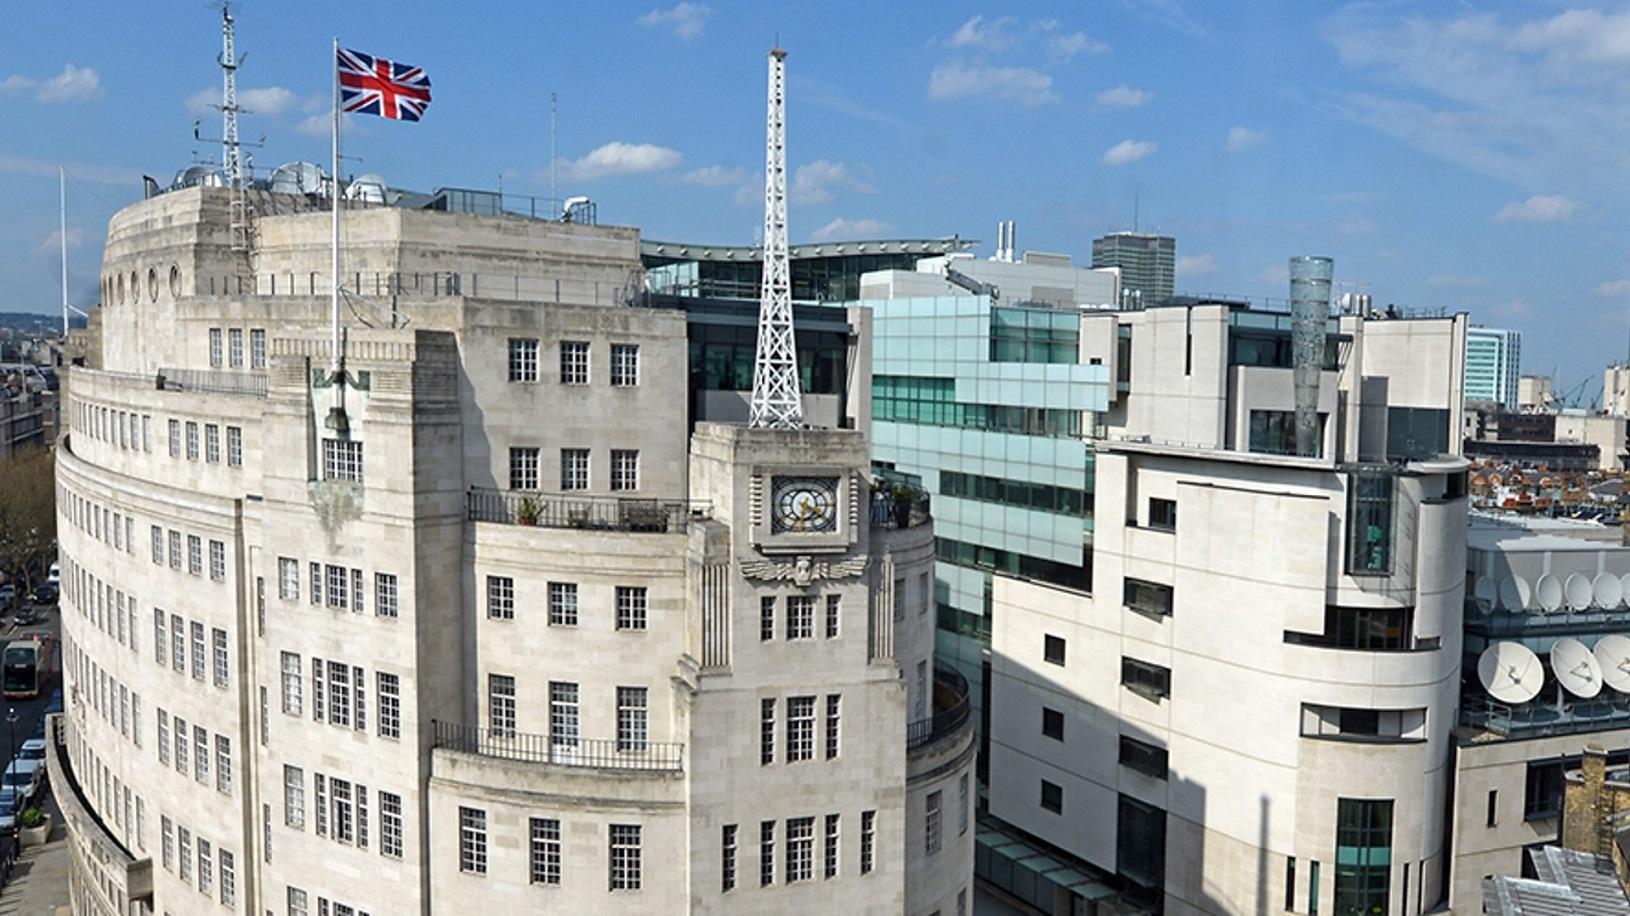 BBC Broadcasting House pic.jpg